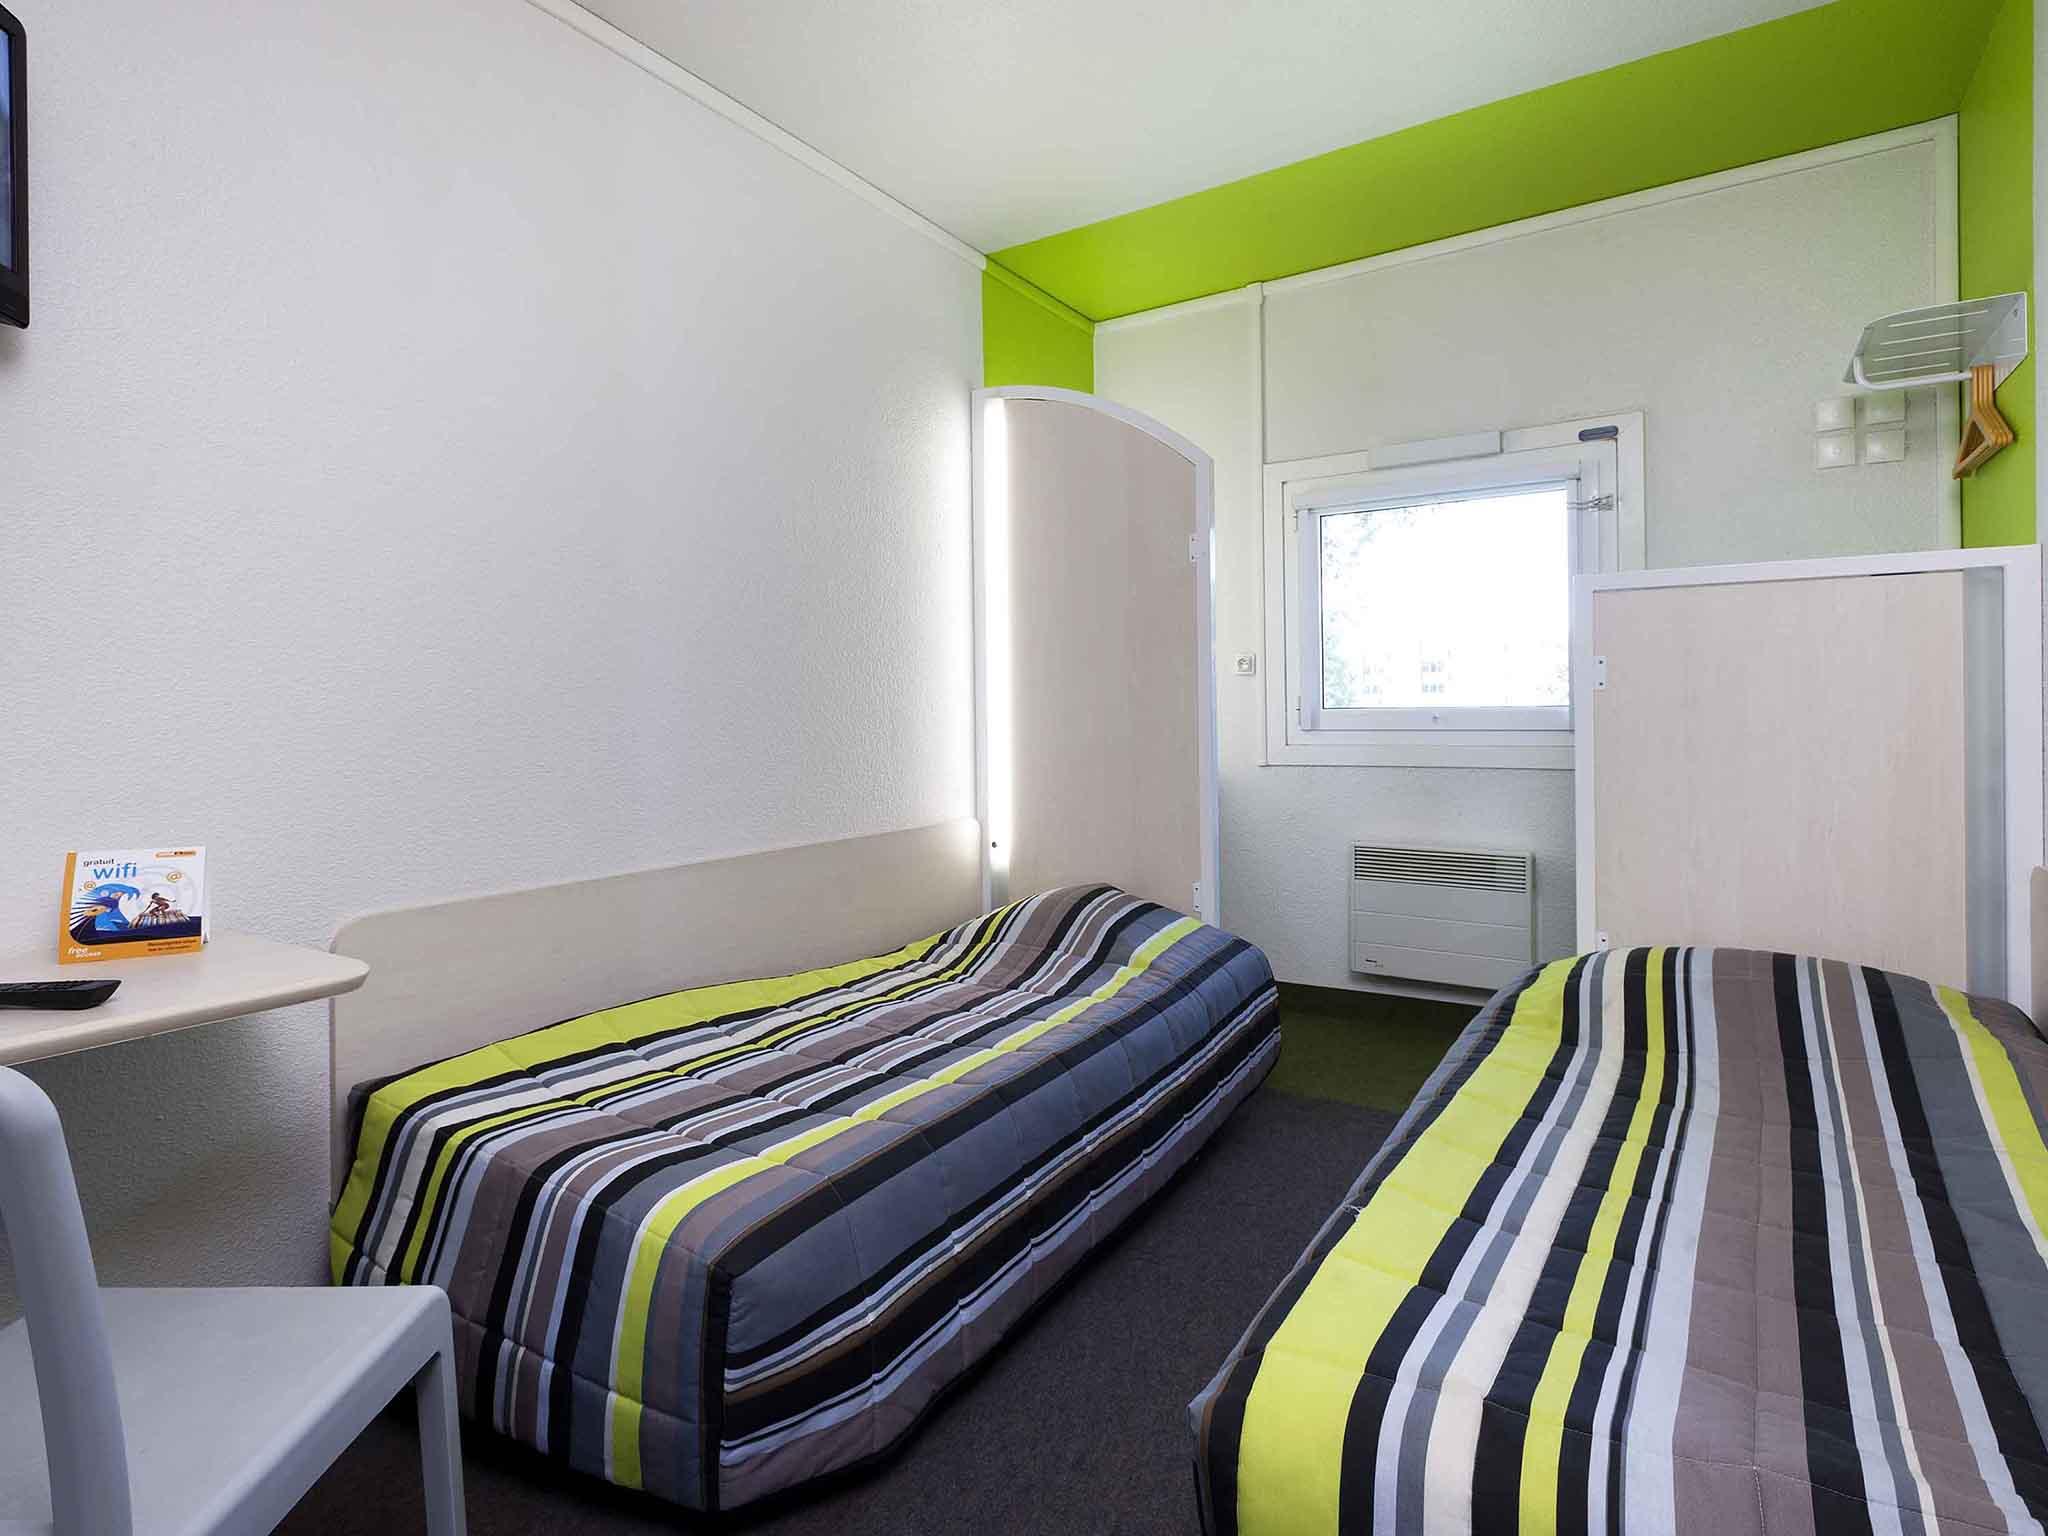 Hotel – hotelF1 Epinal Nord